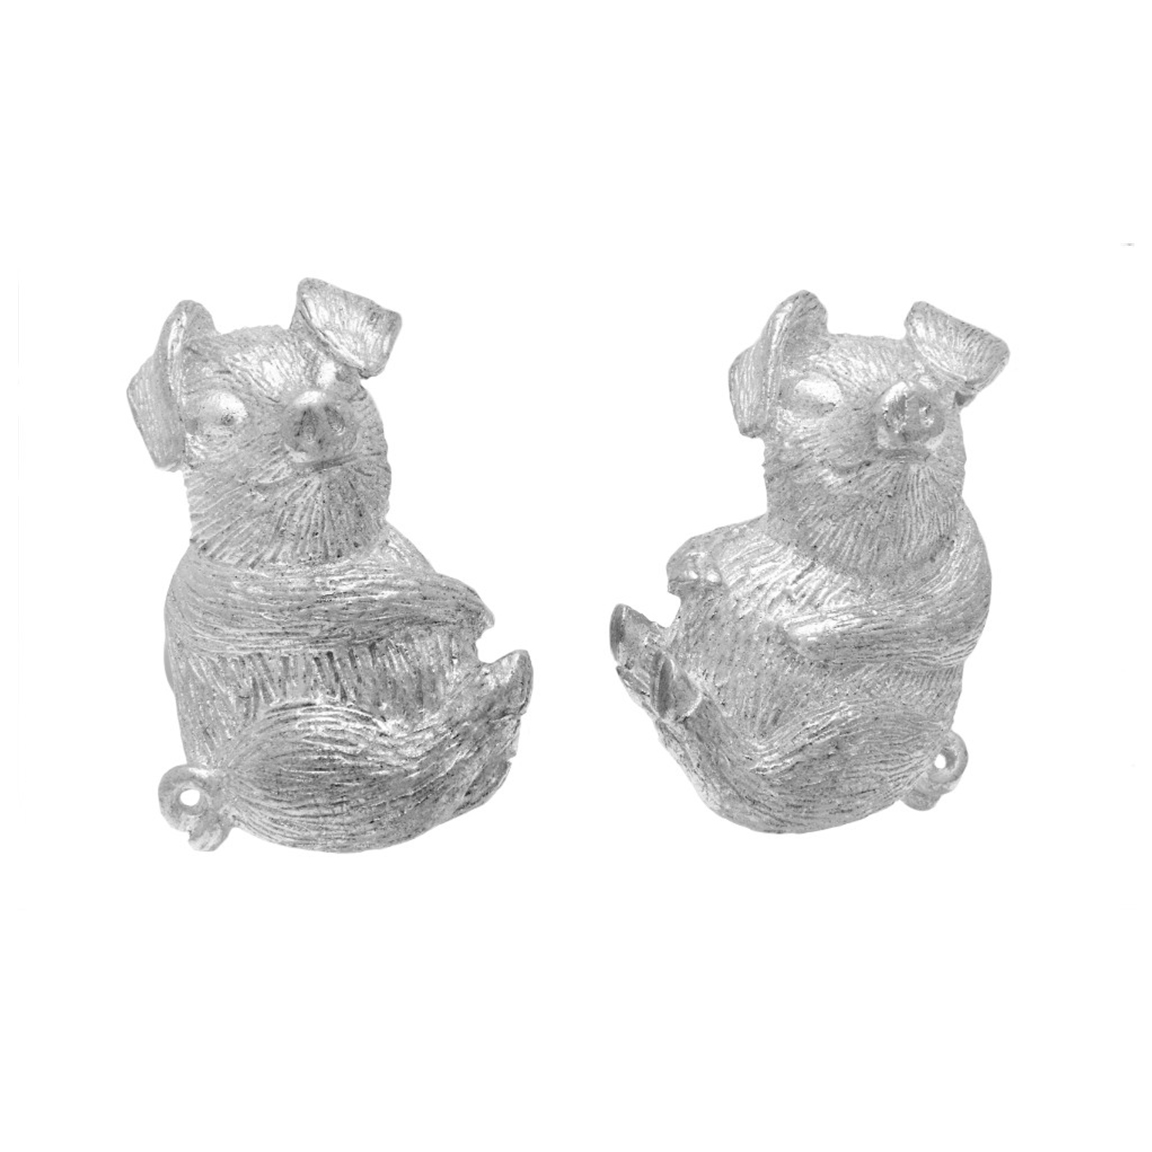 Chinese Zodiac Pig Cufflink